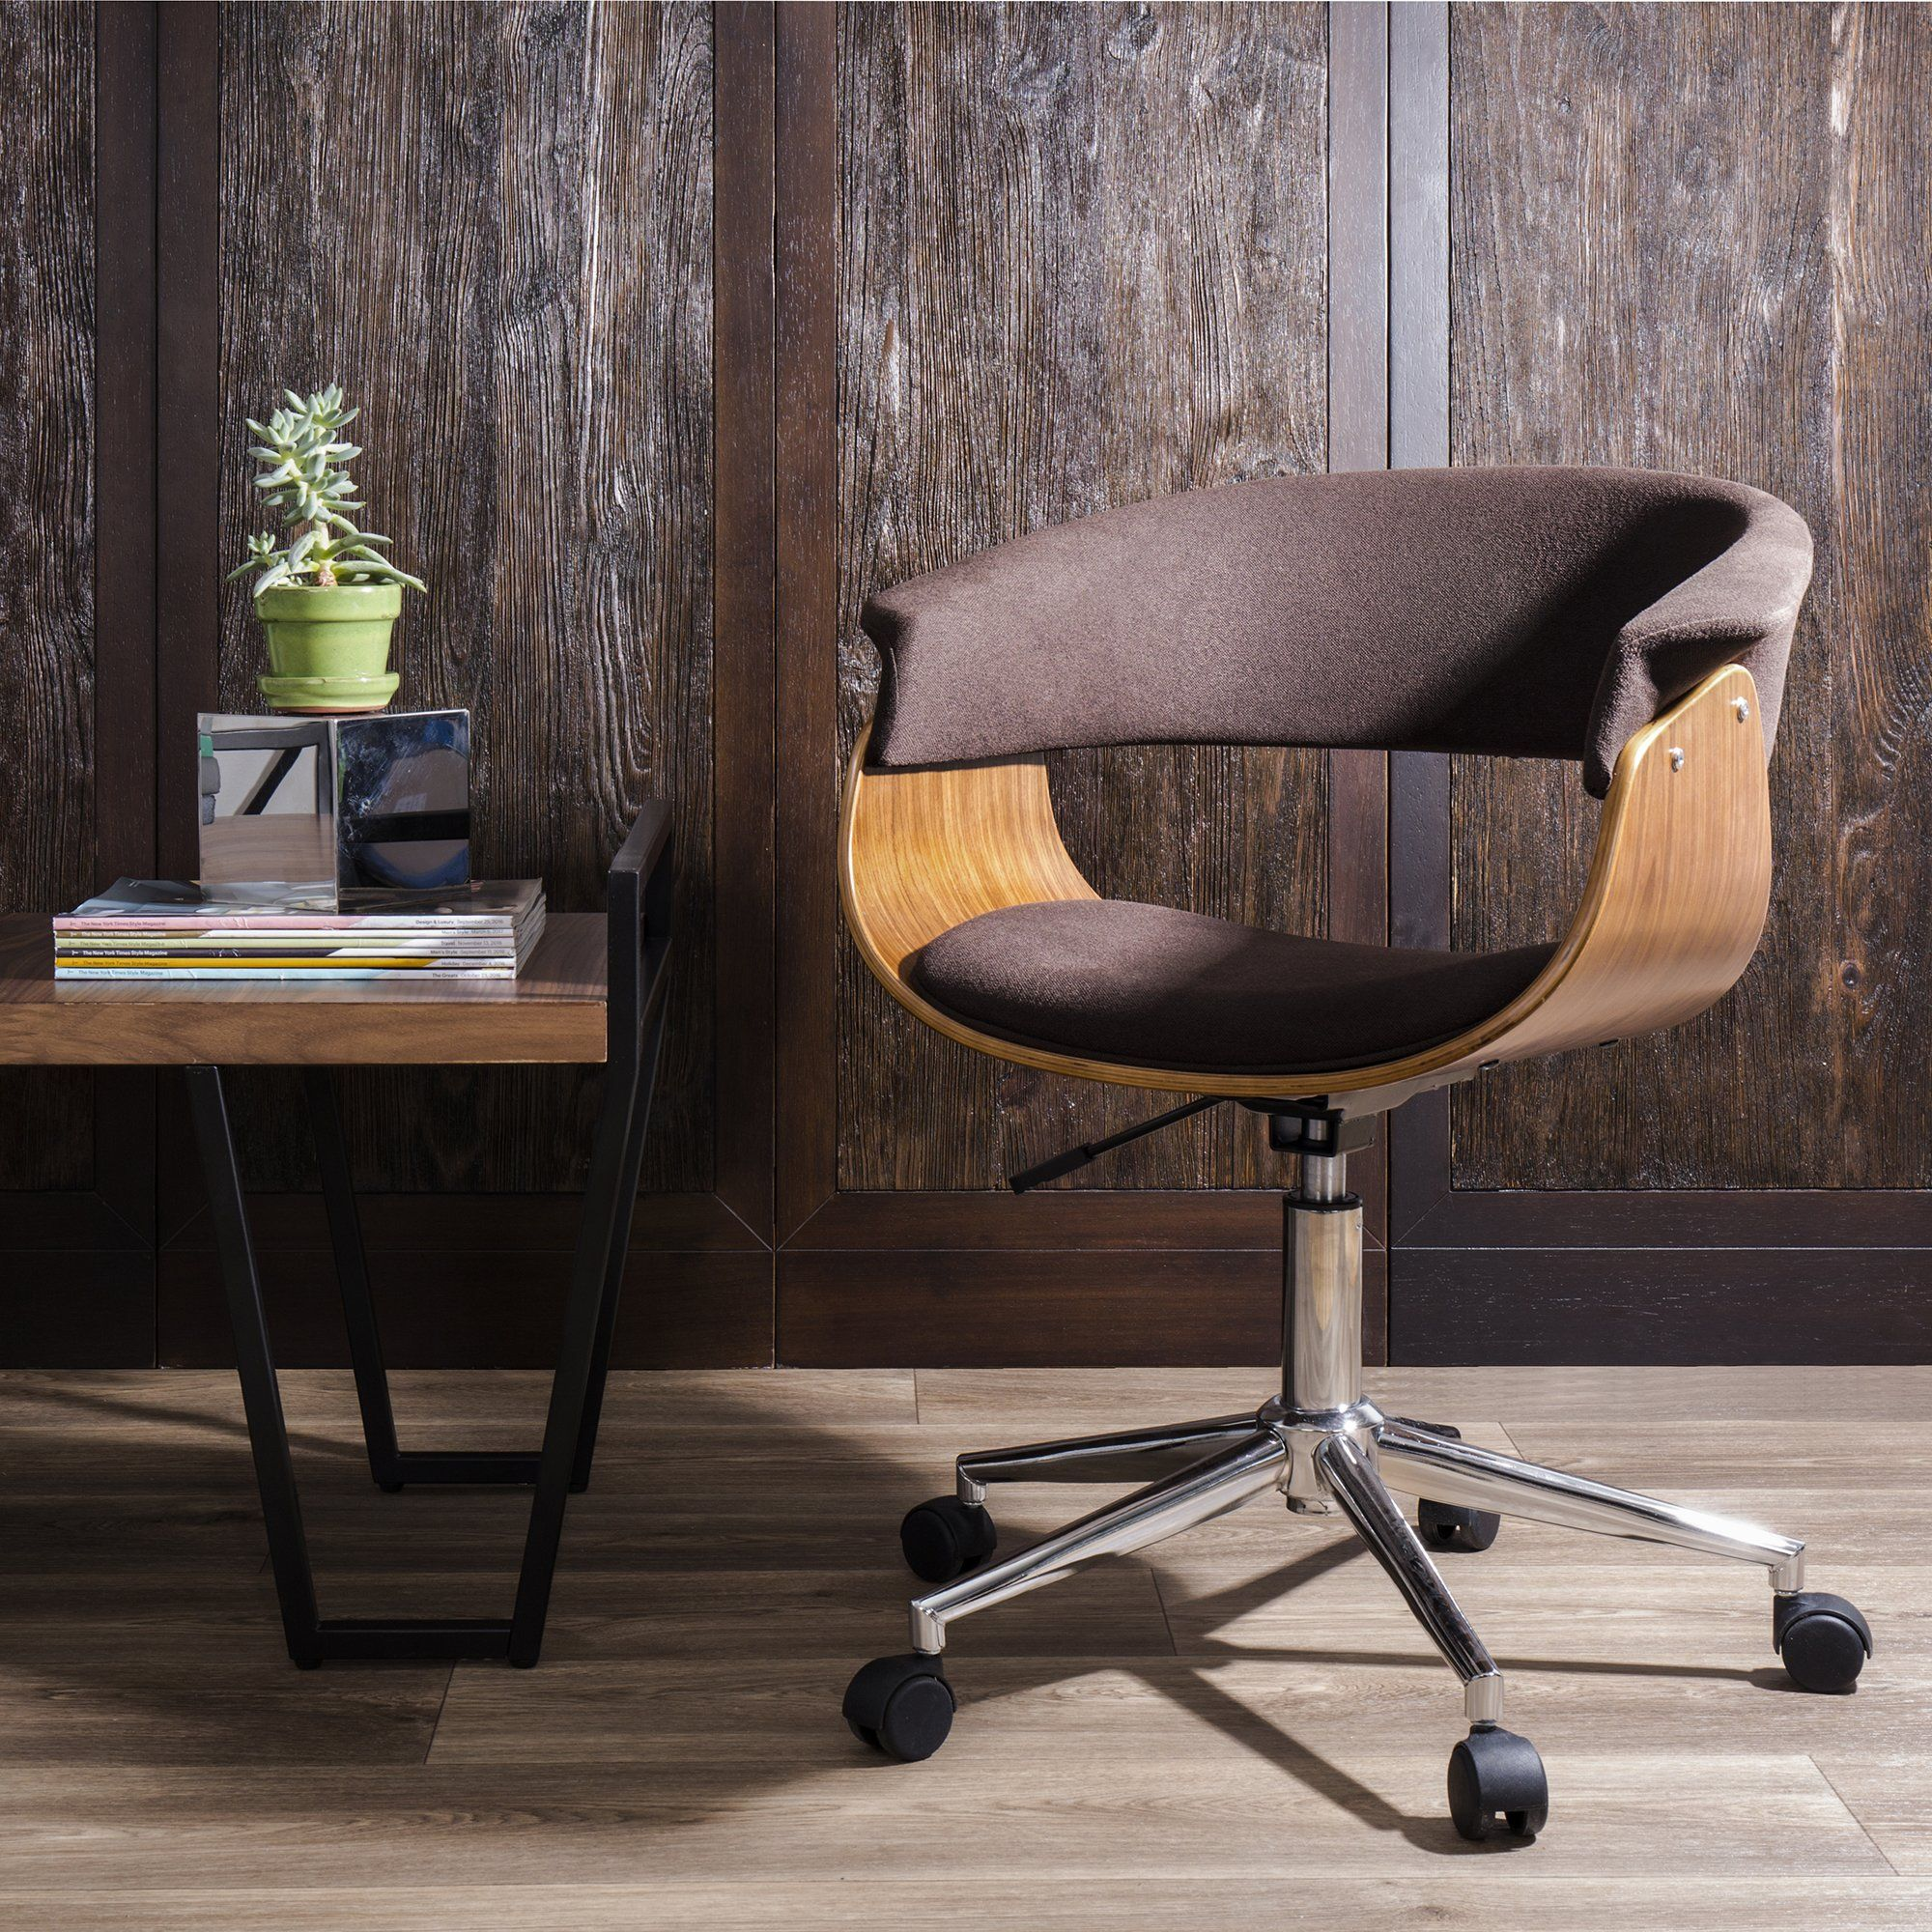 Mid Century Office Chair Mid Century Modern Office Furniture Cornell Swivel Mid Century Modern Office Chair Modern Office Chair Mid Century Modern Desk Chair